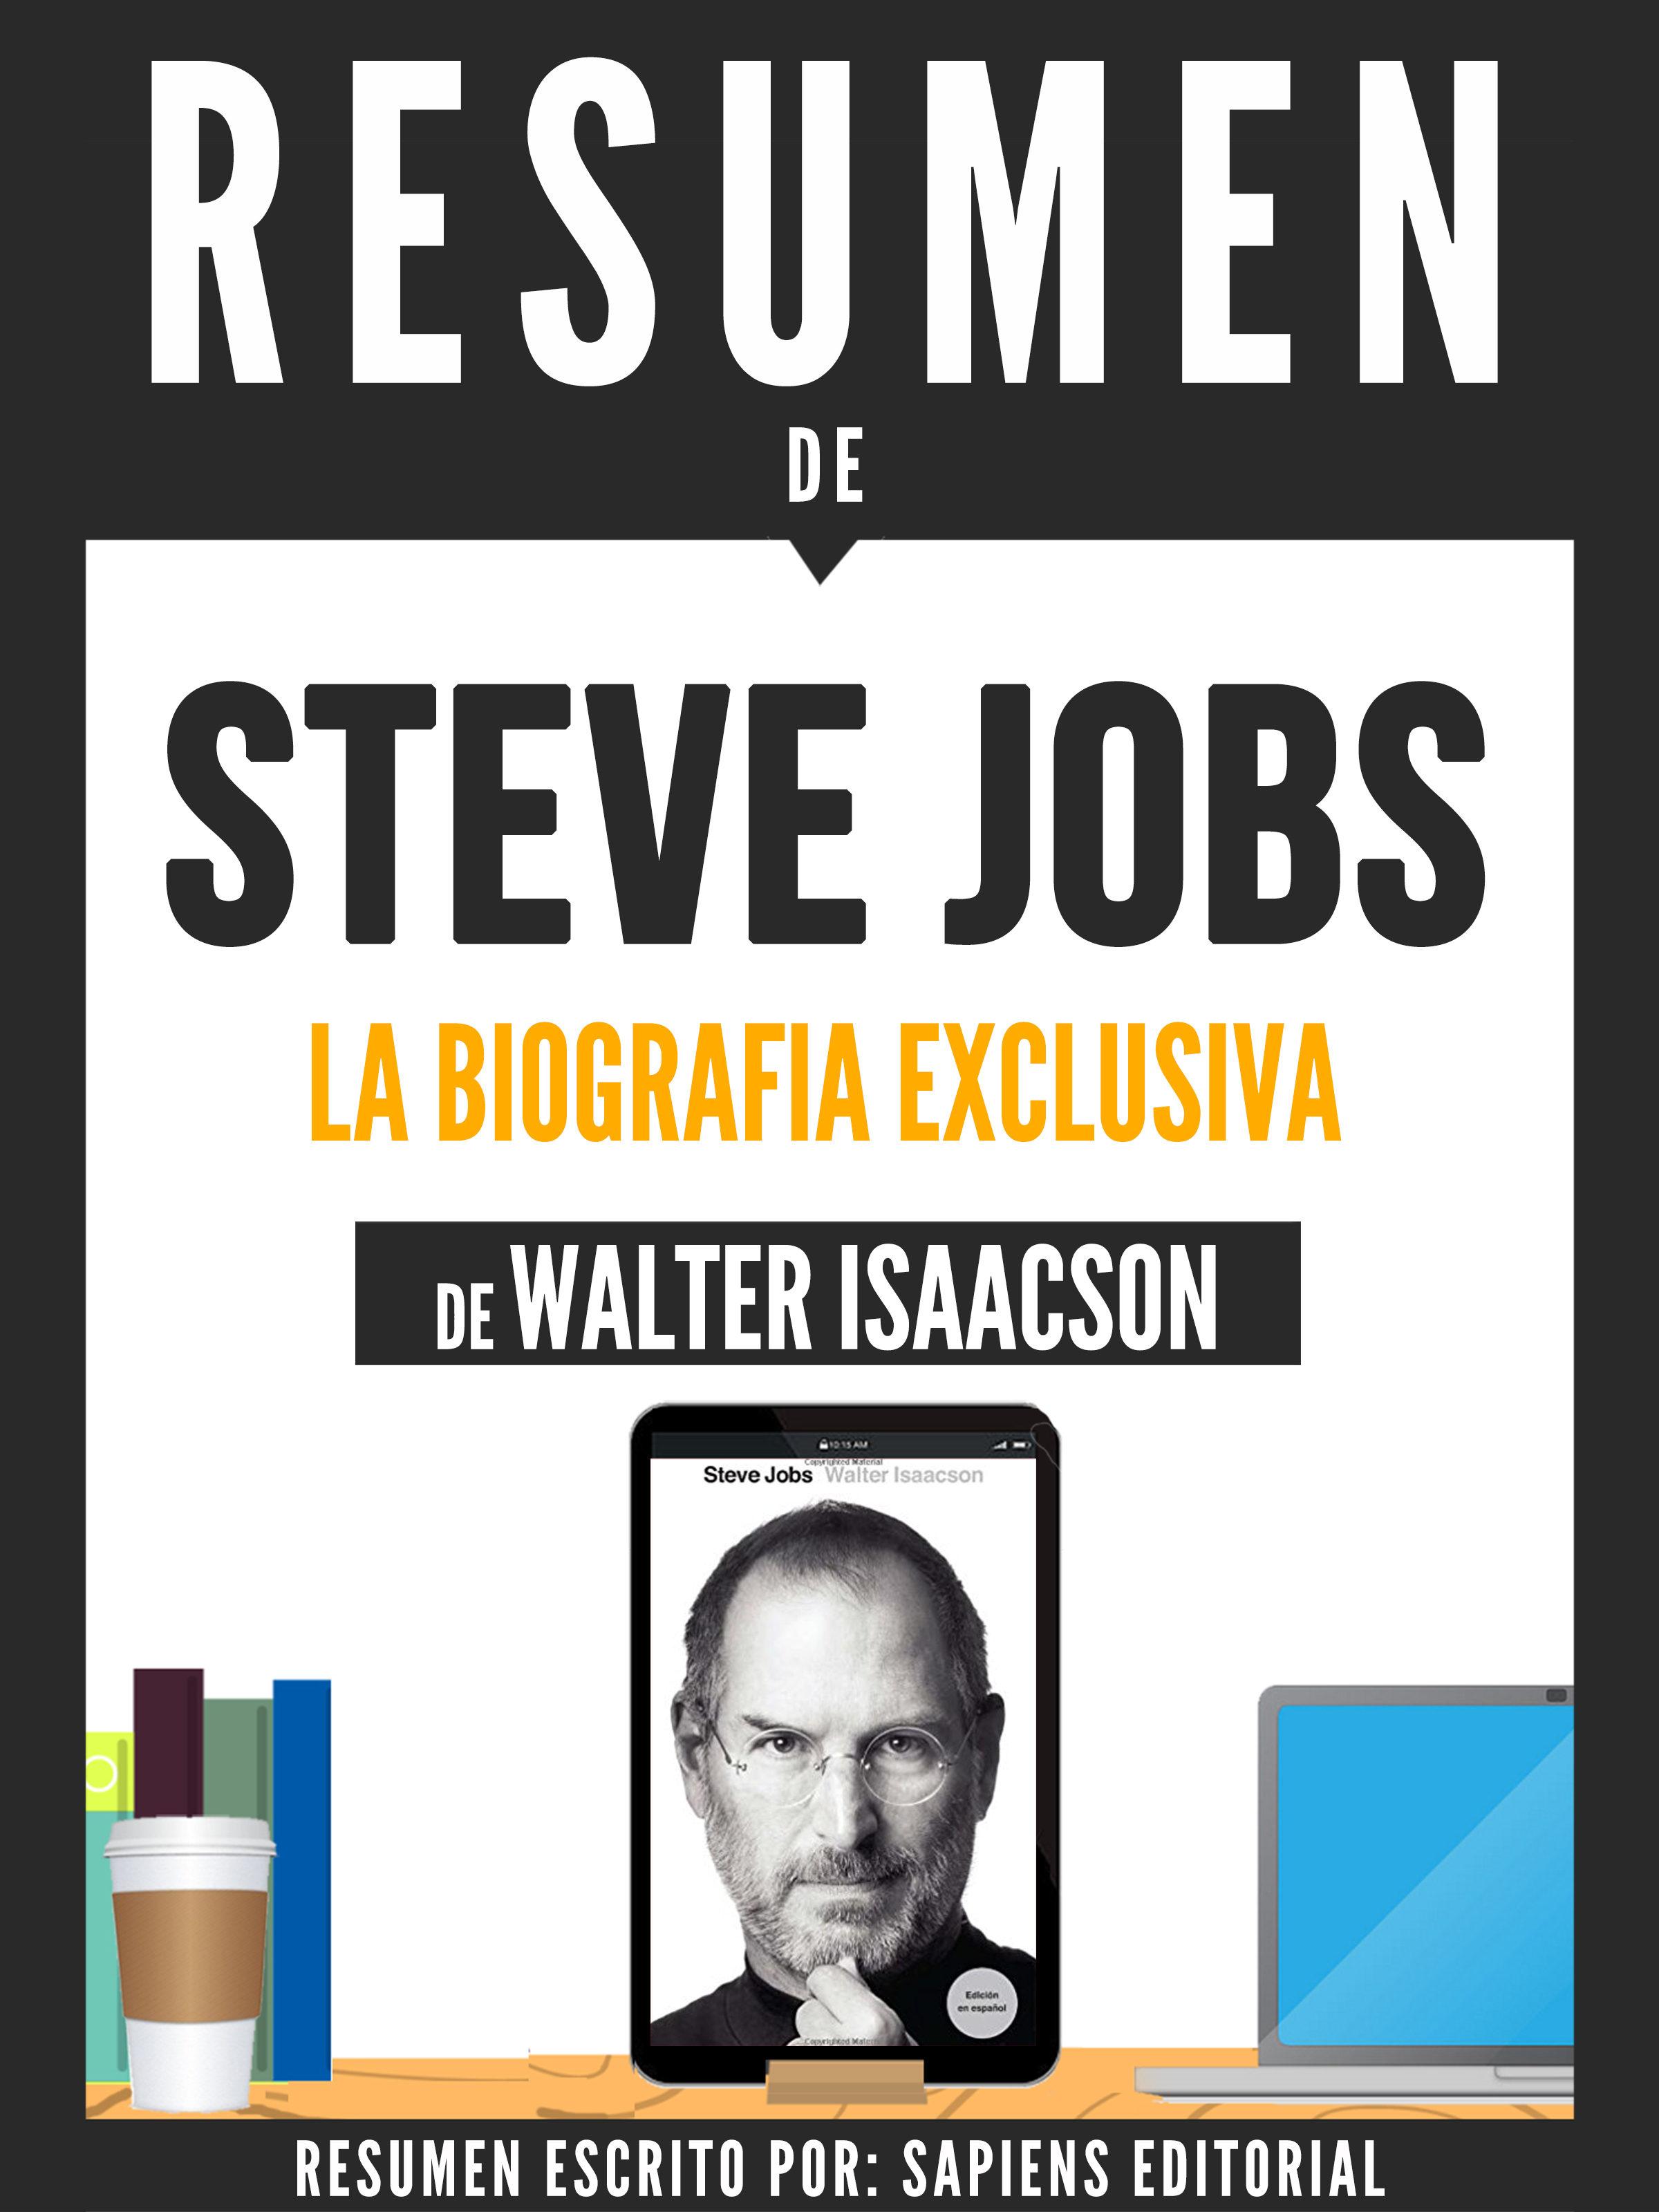 resumen de steve jobs la biografia exclusiva de walter